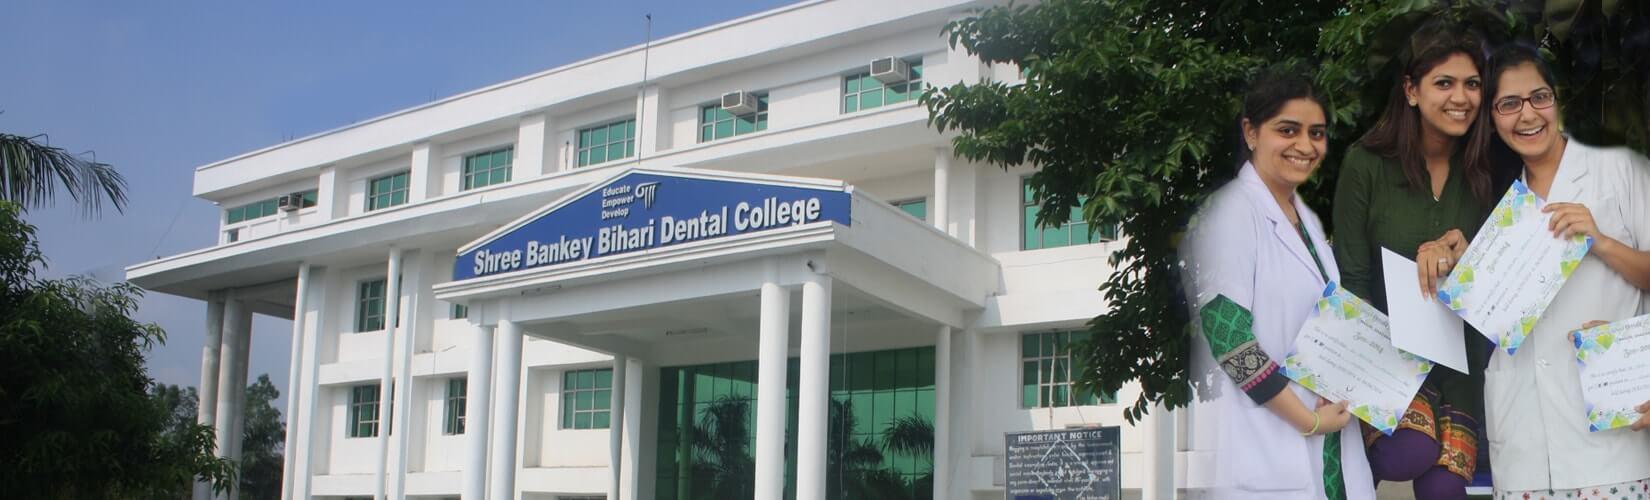 Shree Bankey Bihari Dental College and Research Centre, Masuri Image